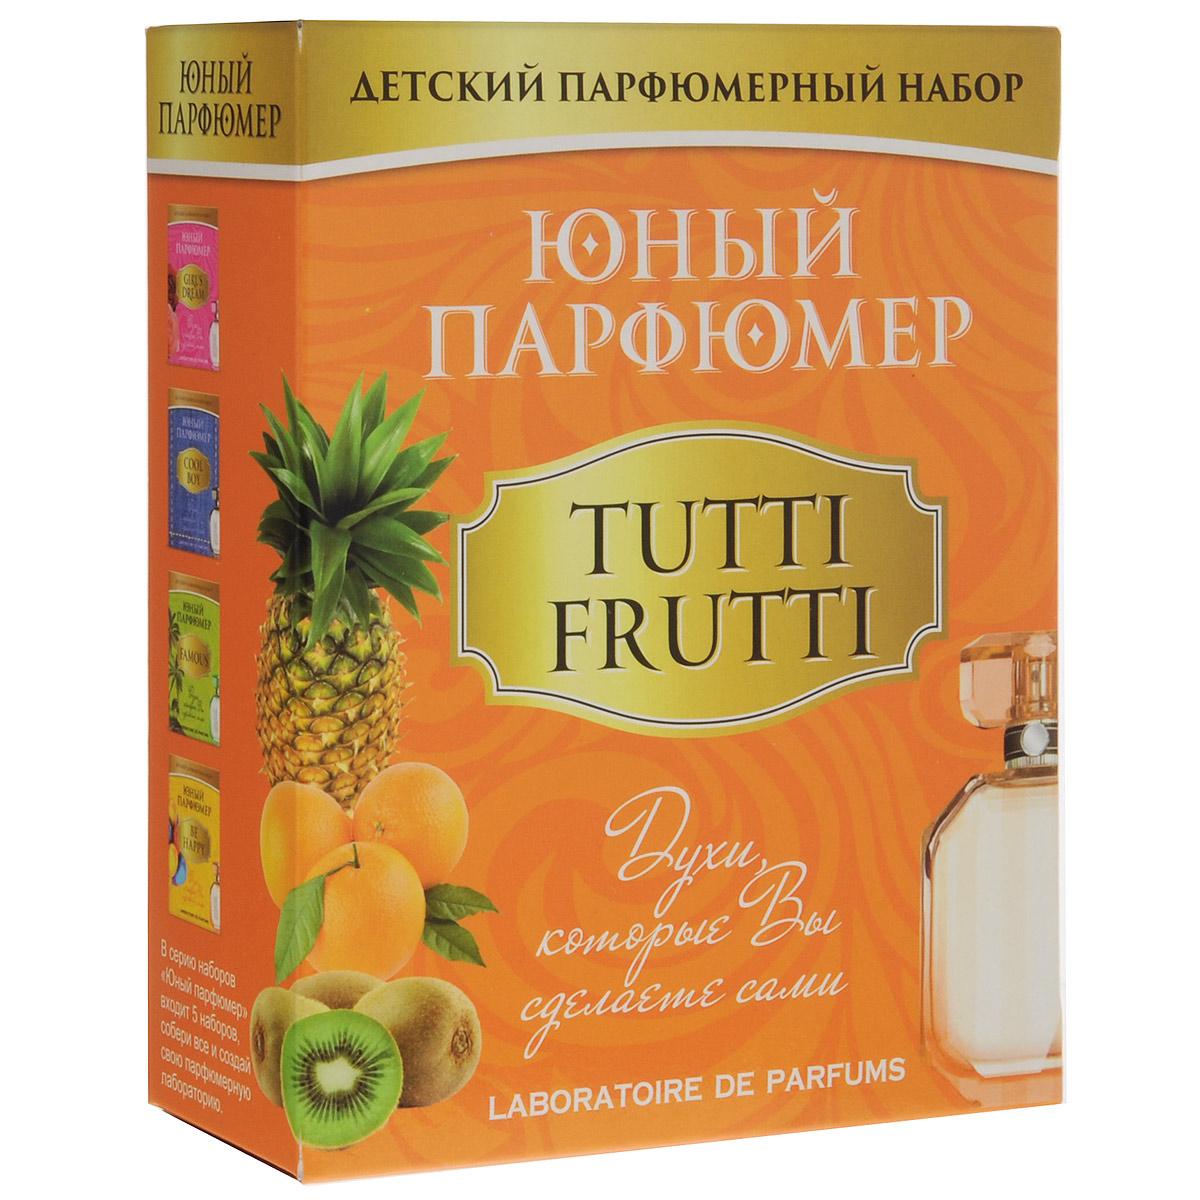 "Набор для создания духов ""Юный парфюмер. Tutti Frutti"", Каррас"